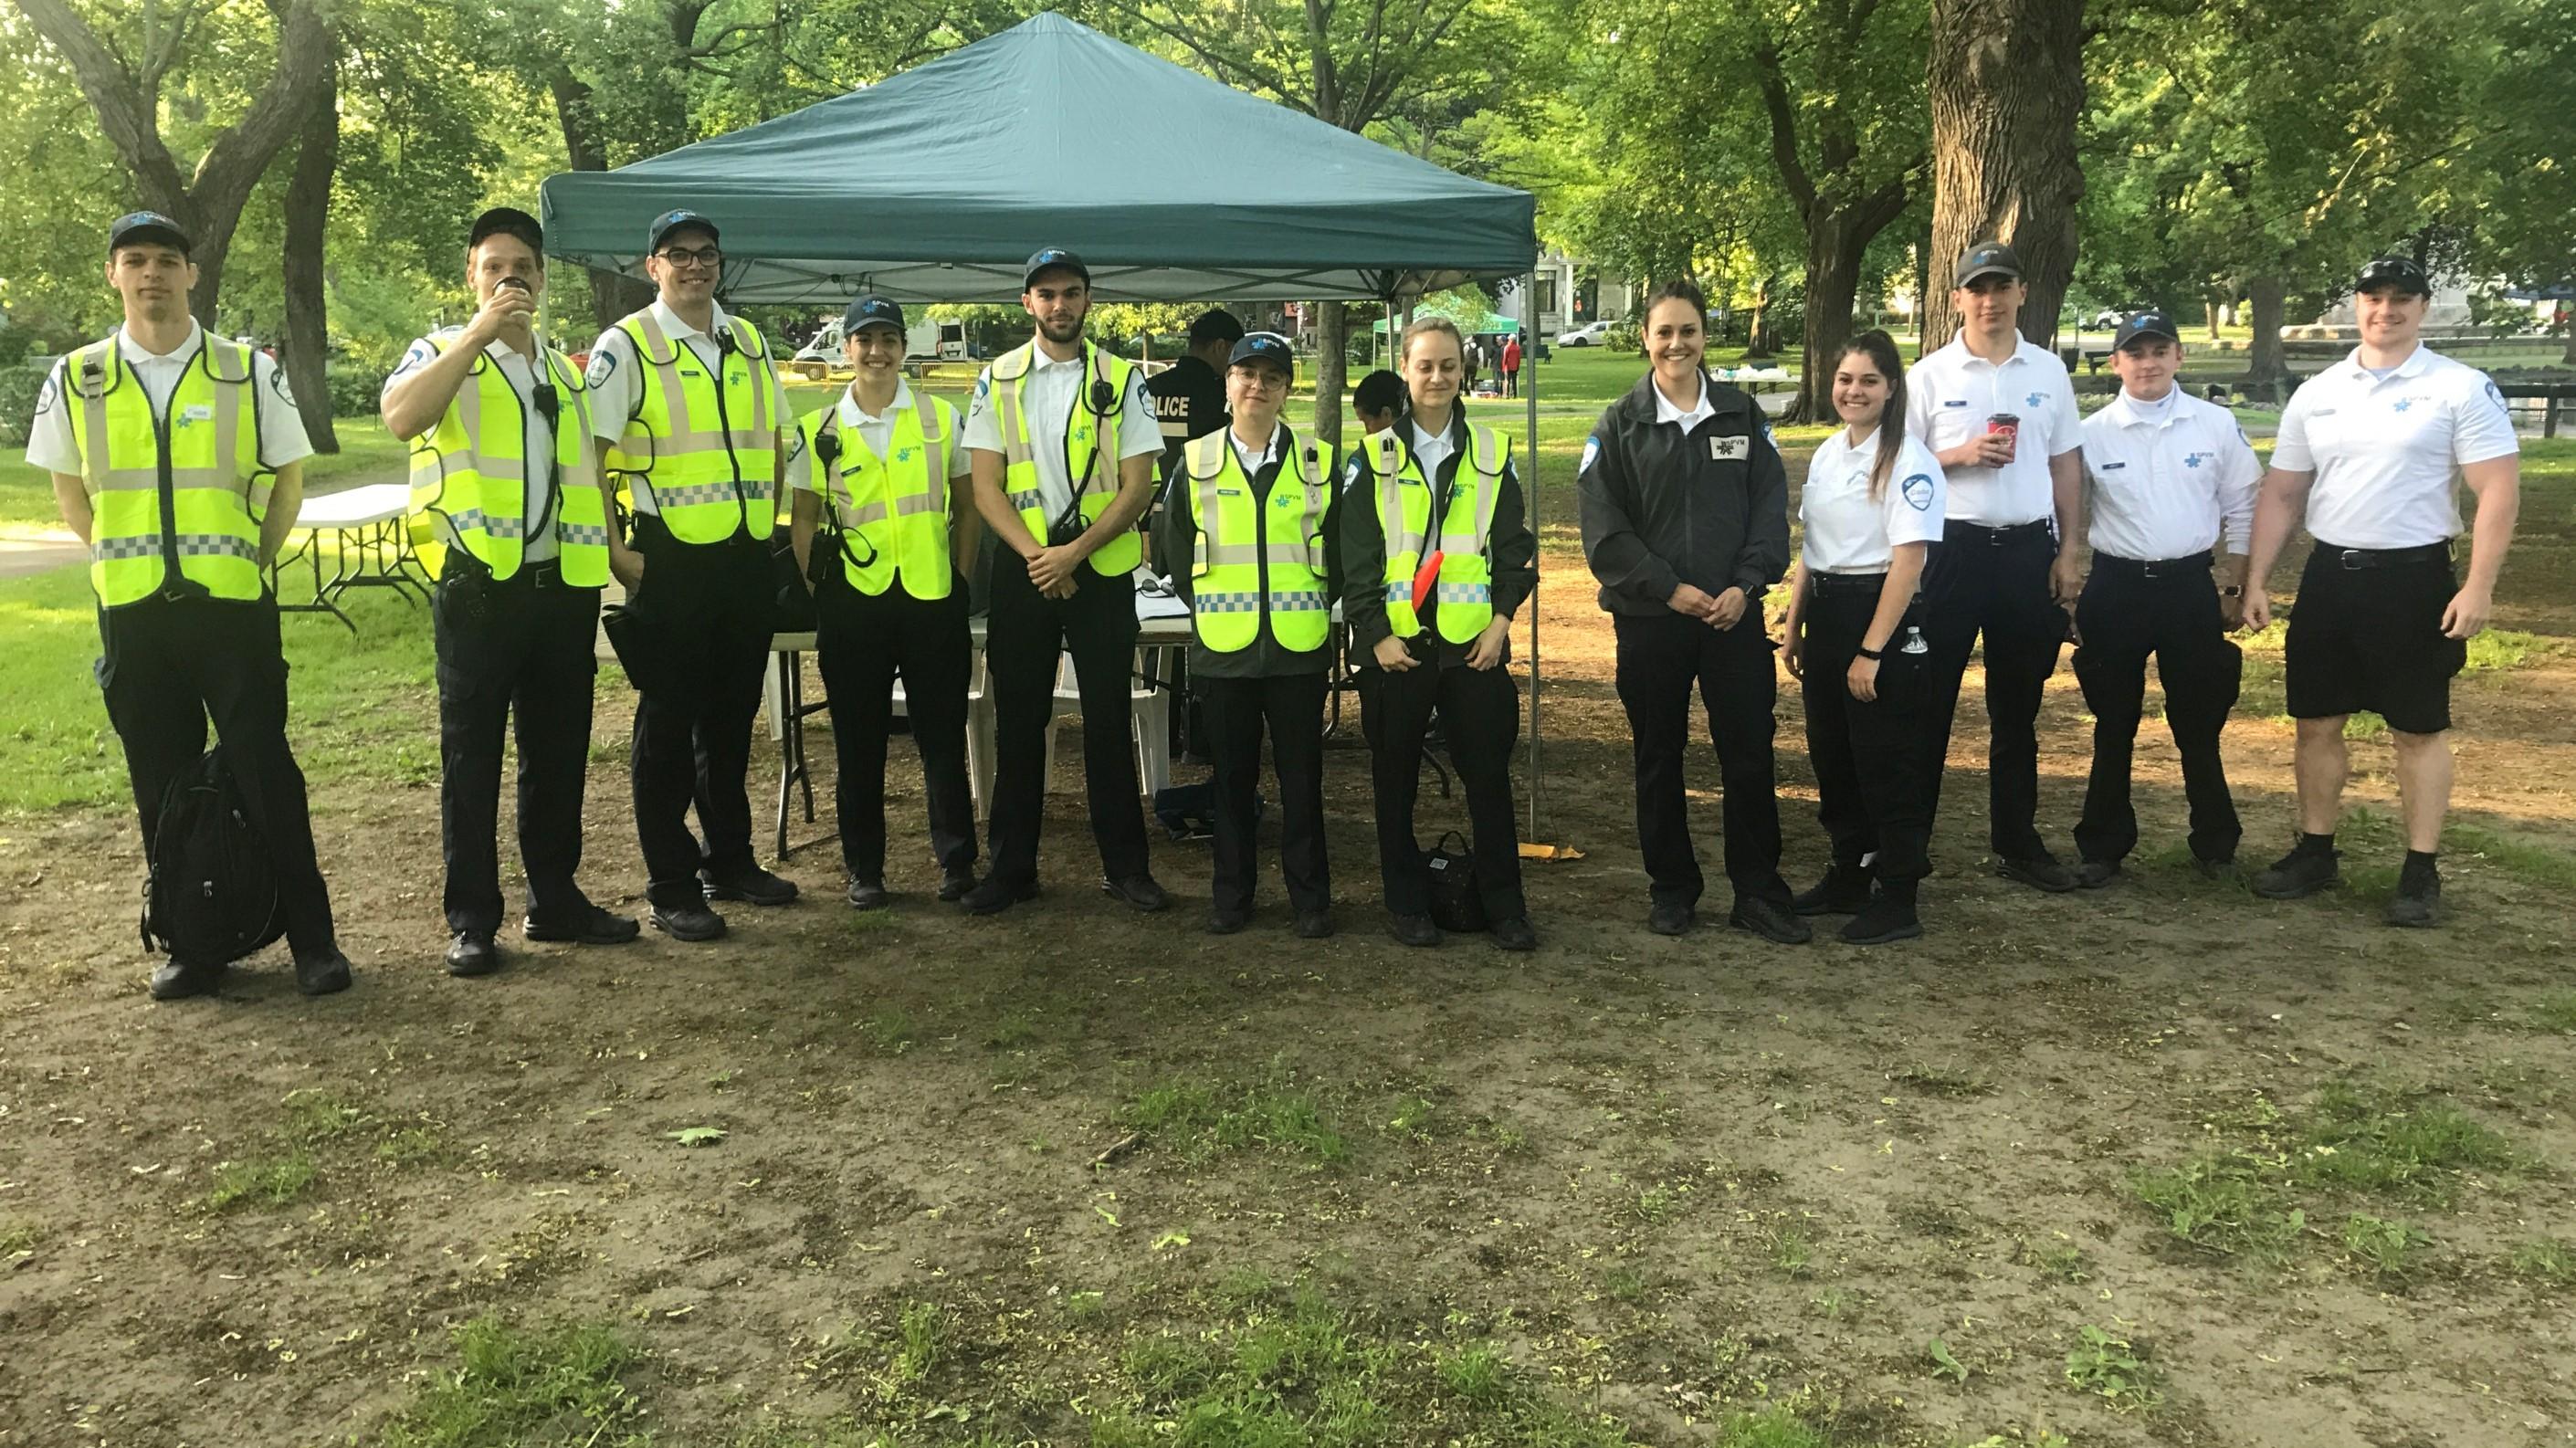 Foulée des Parcs 2019 Equipe Police Widescreen